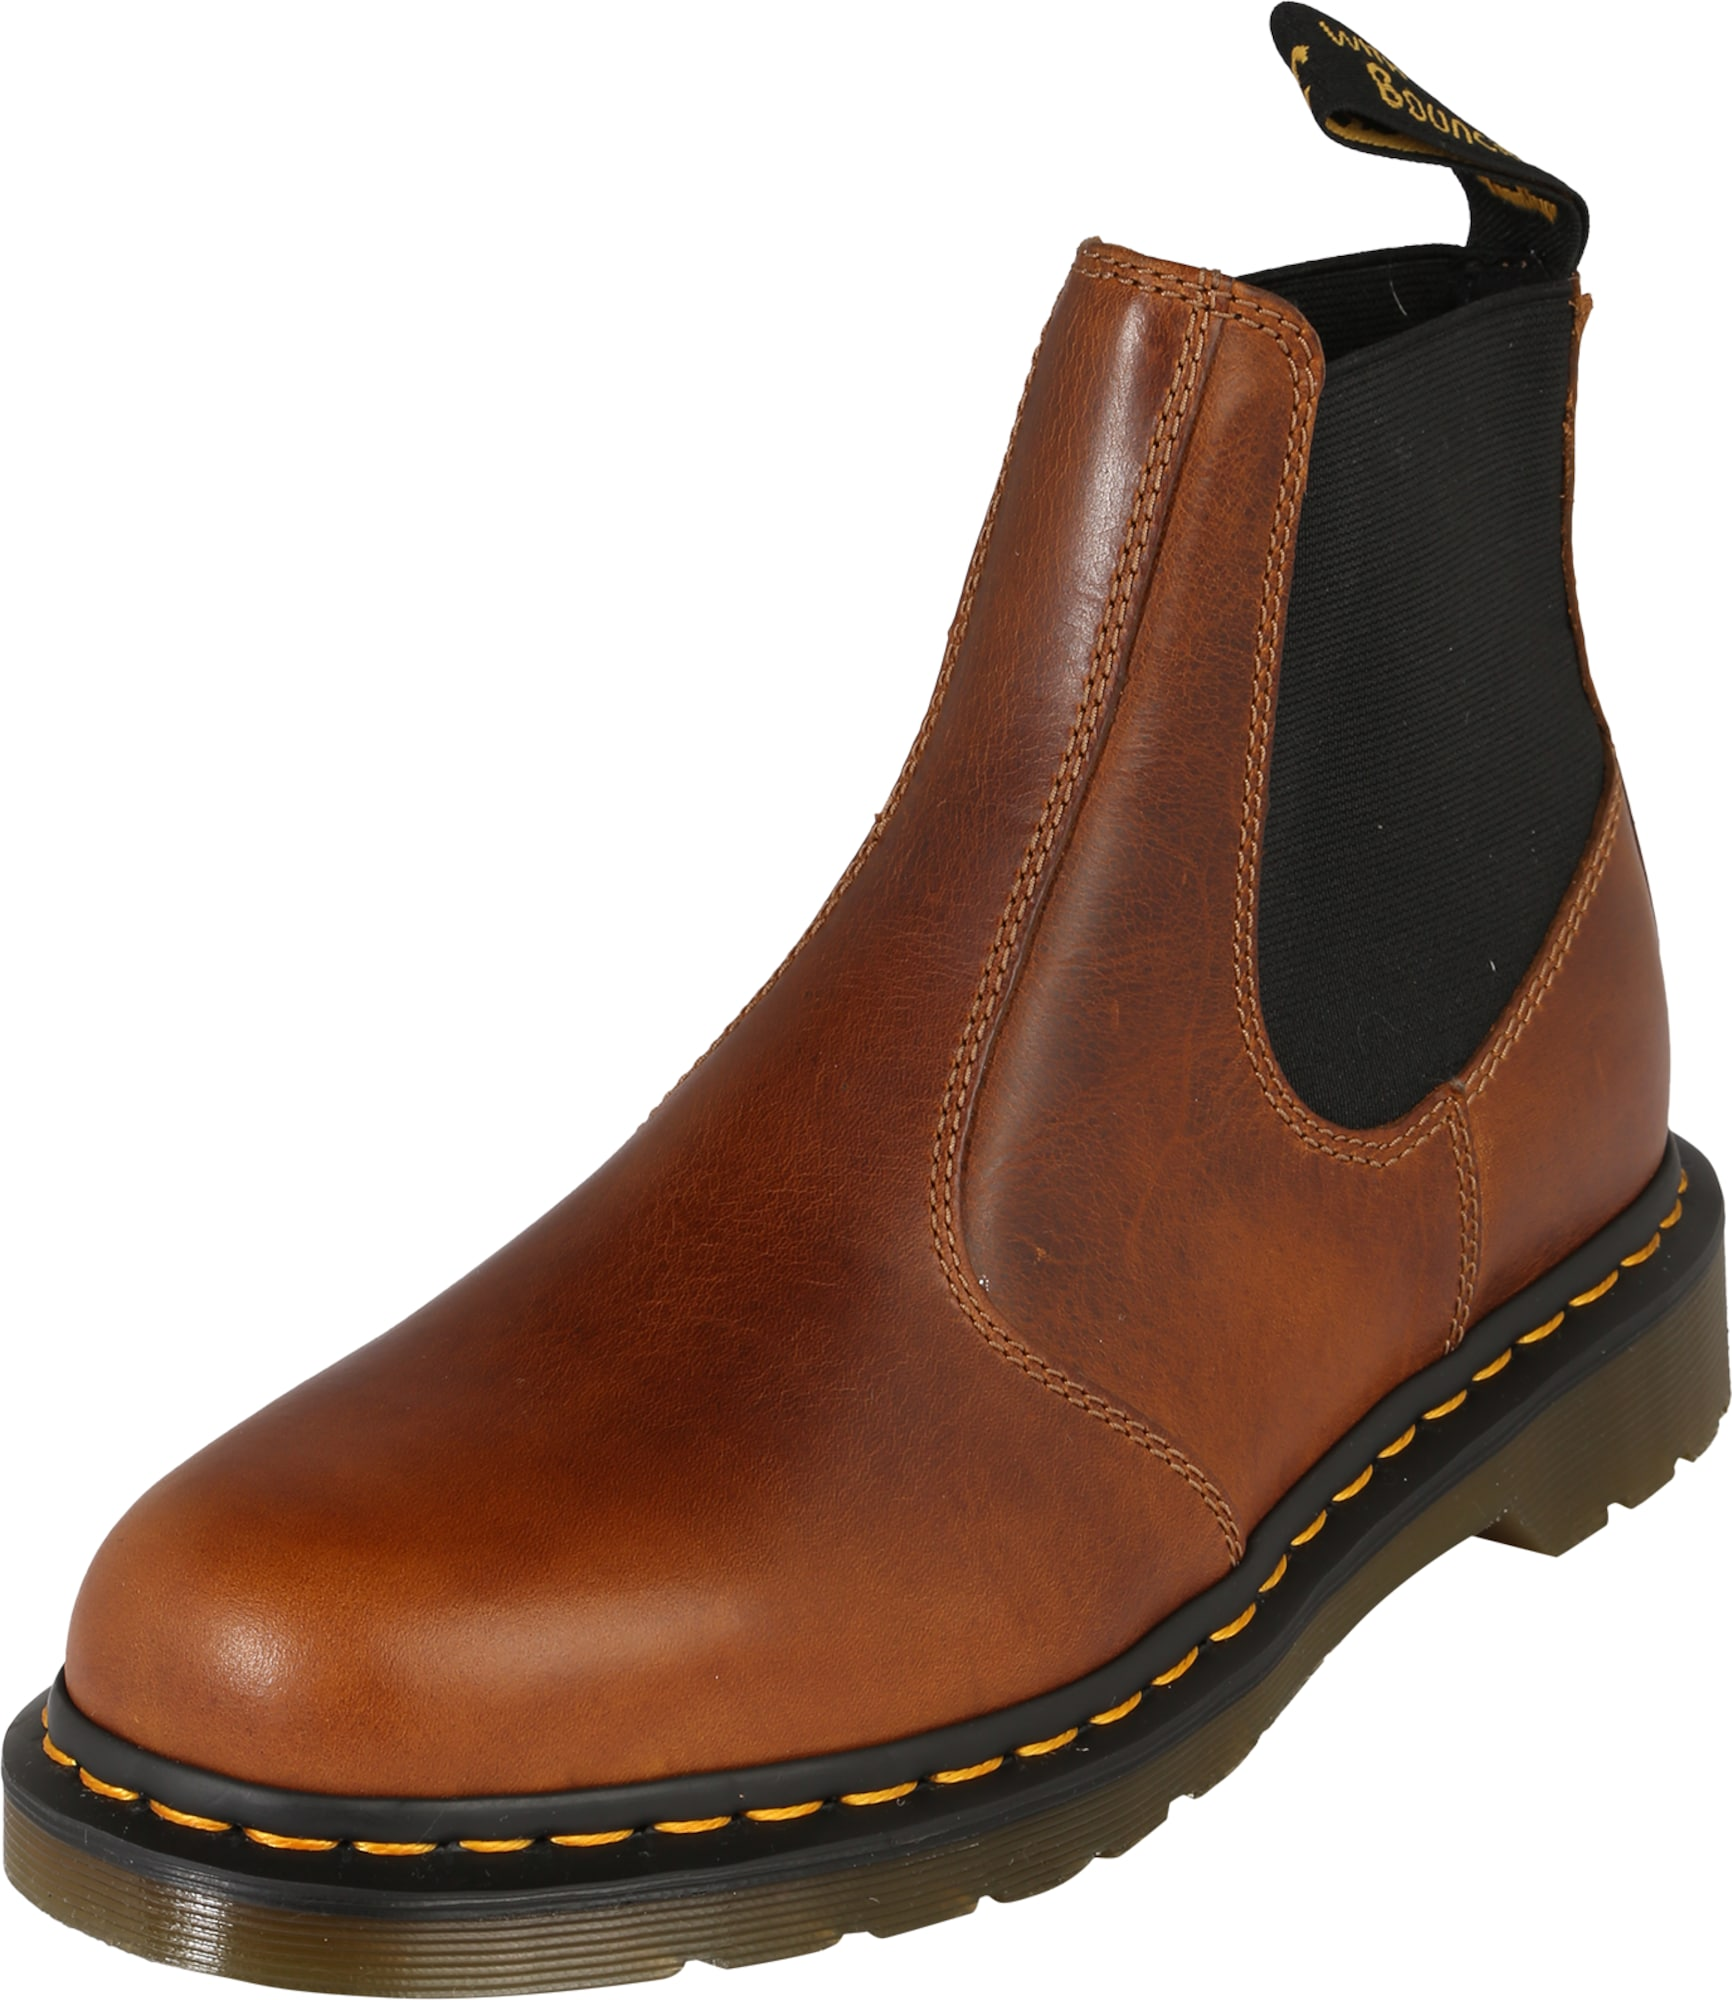 dr martens chelsea boot aus leder 39 hardy 39 in braun about you. Black Bedroom Furniture Sets. Home Design Ideas